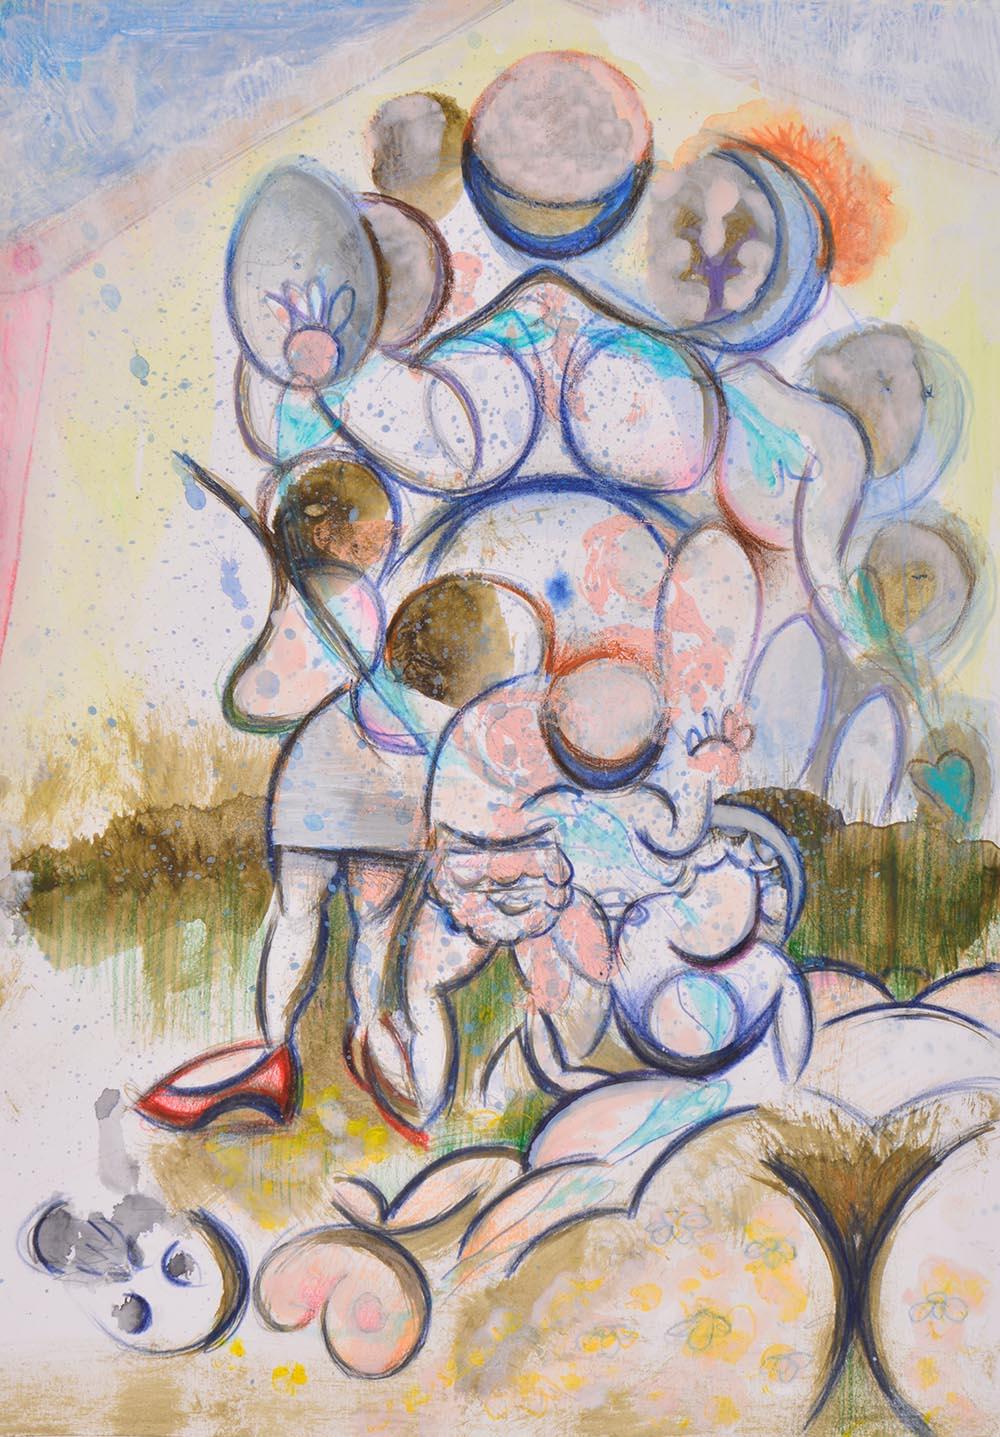 Rosalind Faram, Natal Chart, 2016, watercolor and pencil on paper.